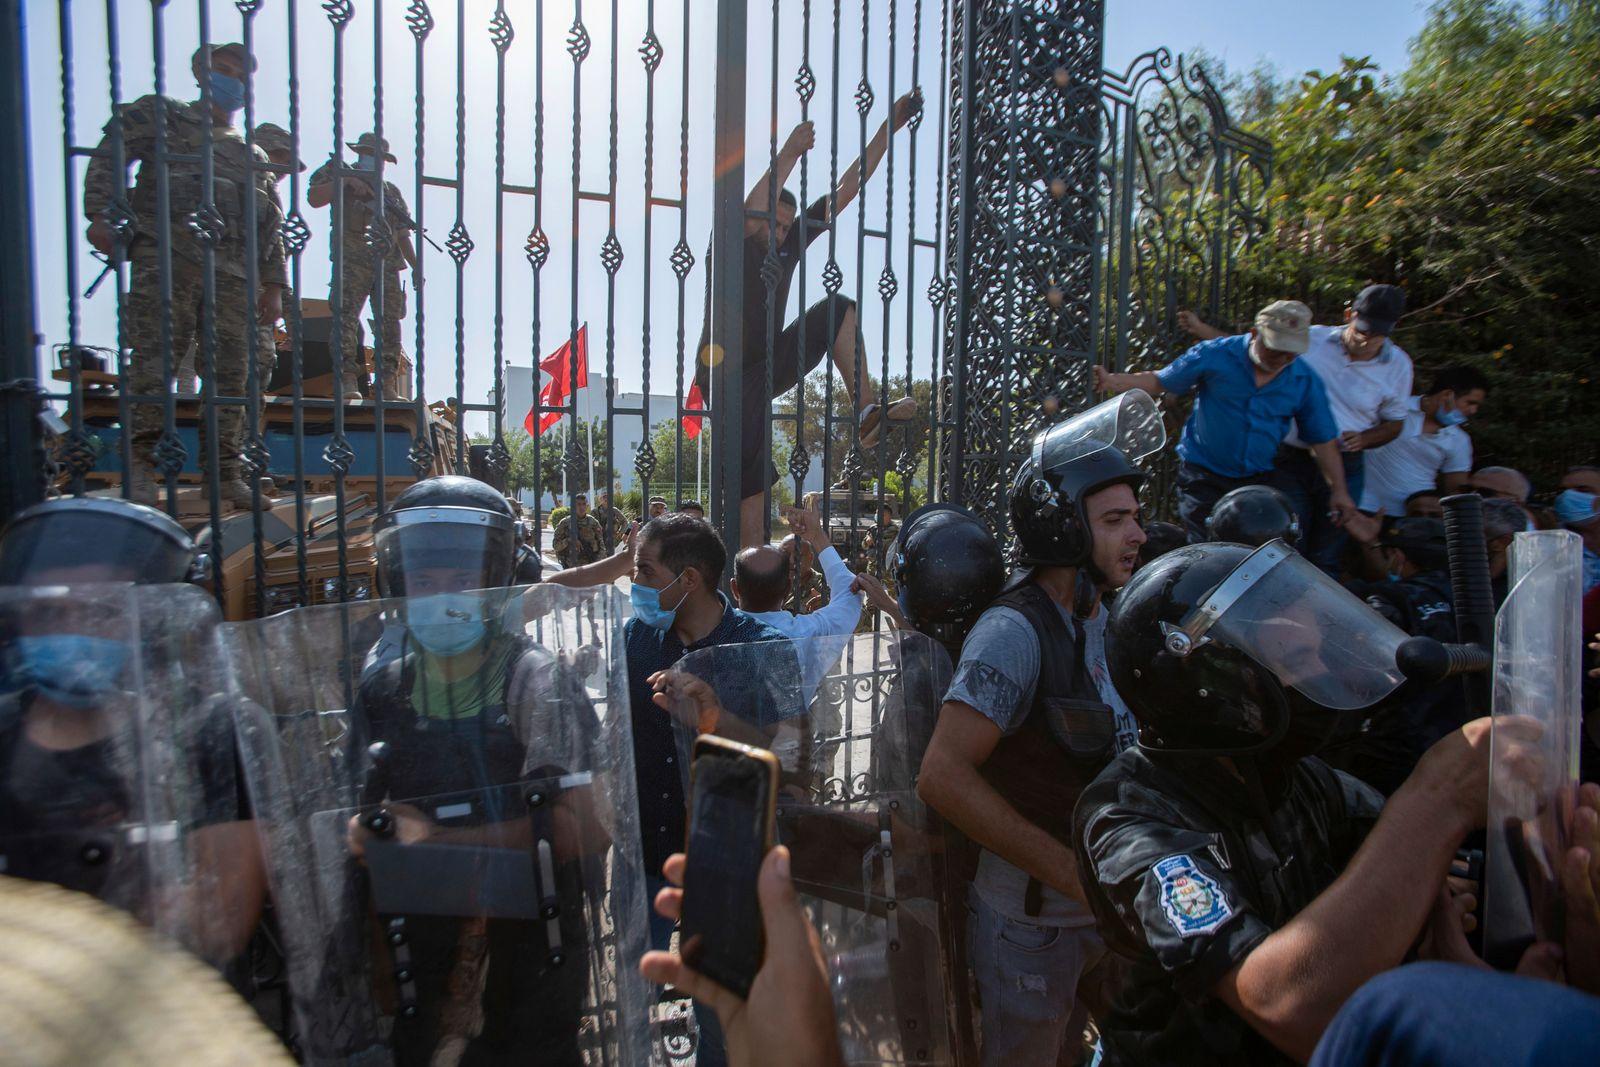 Tunisian President Kais Saied suspends parliament, assumes executive powers